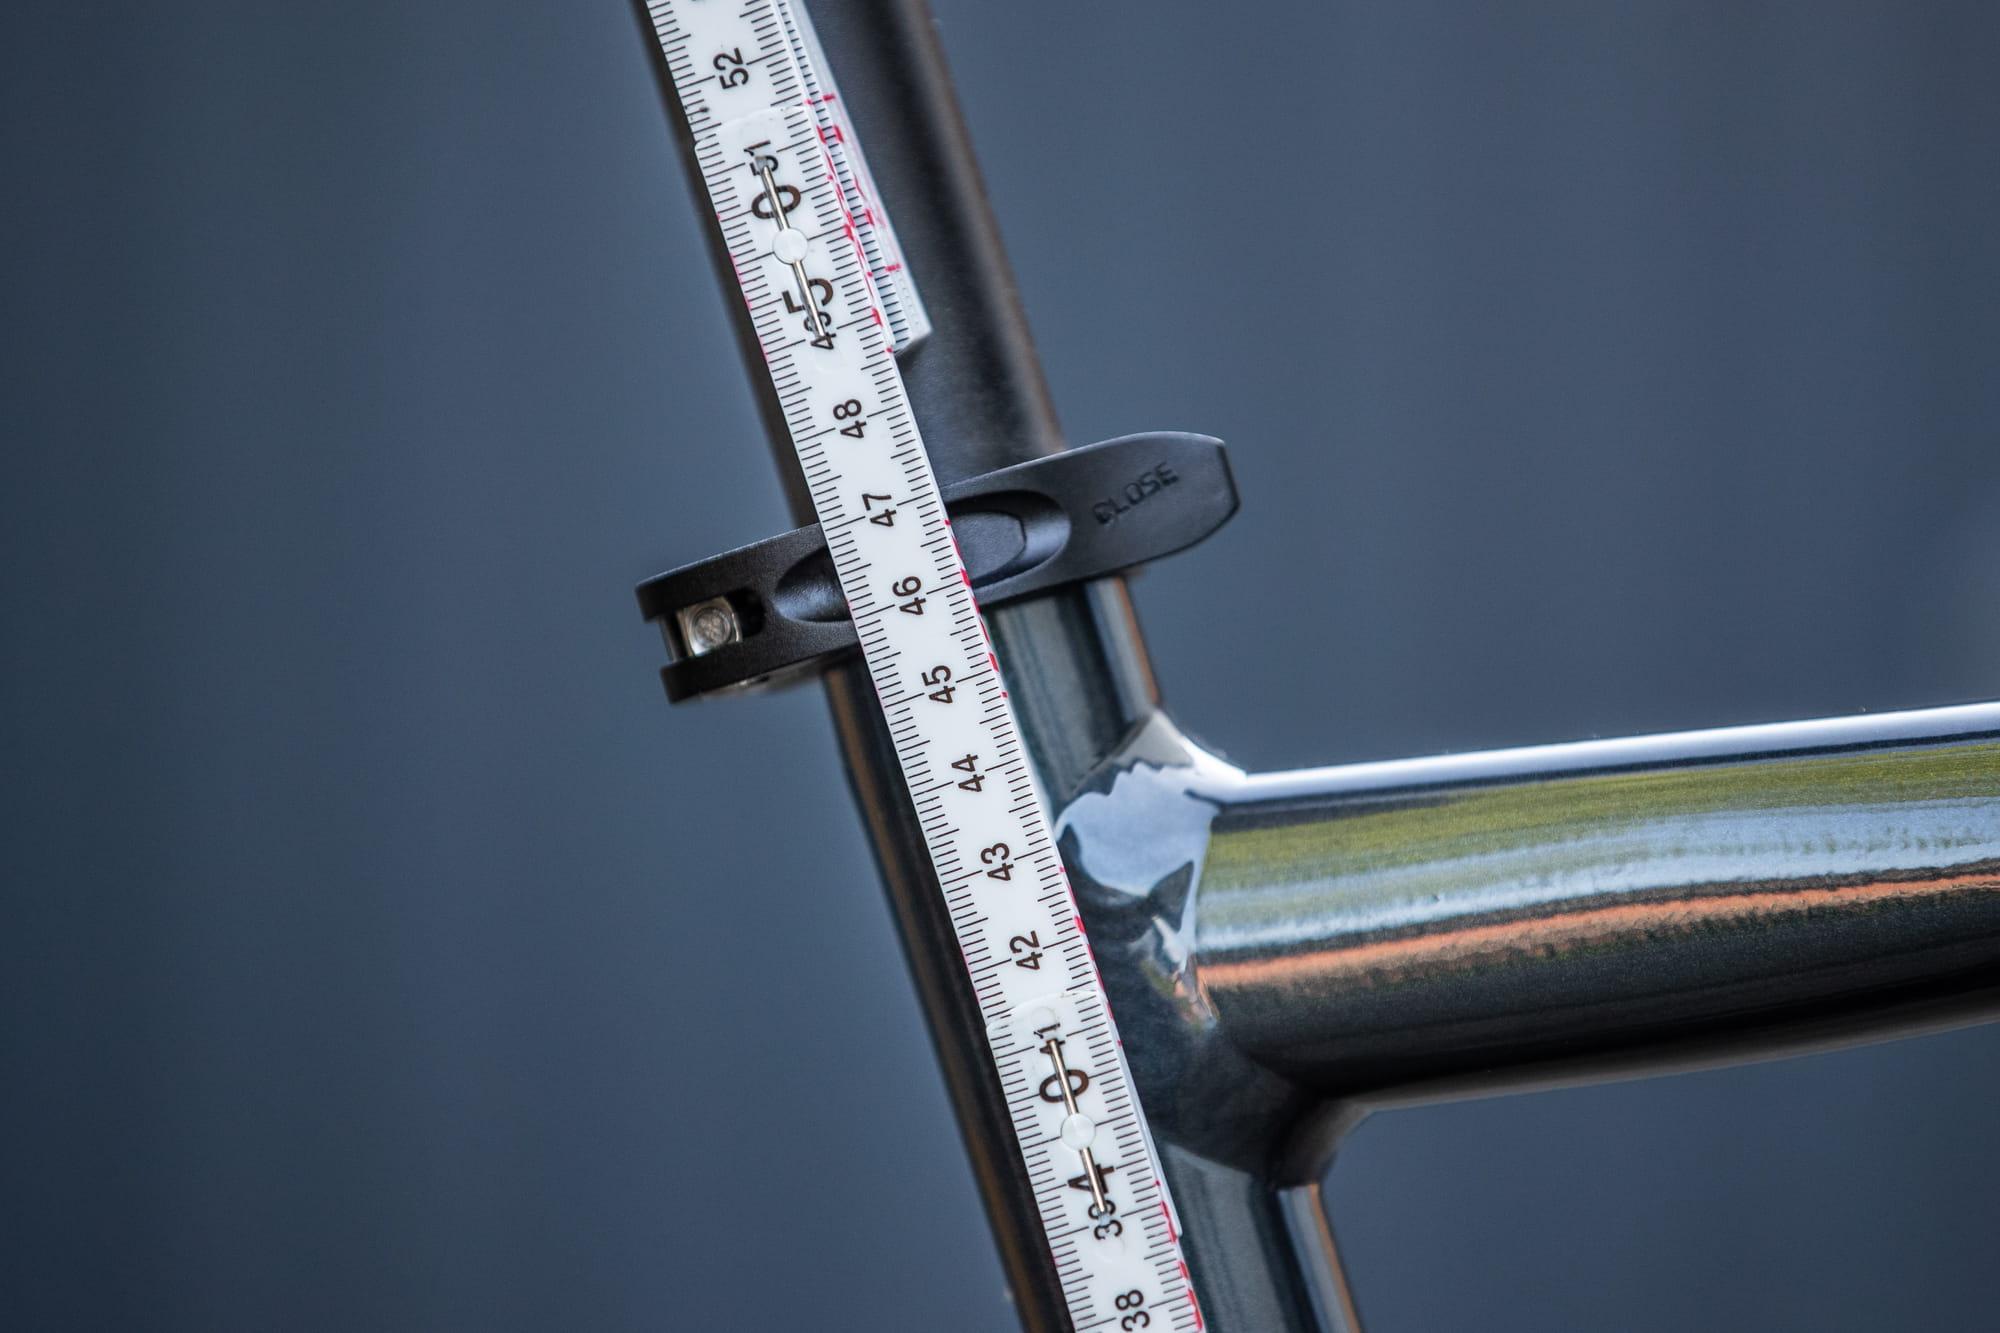 Rahmenh-he-richtig-bestimmen-Bike-Mailorder-2GKb08tAEYo0jh